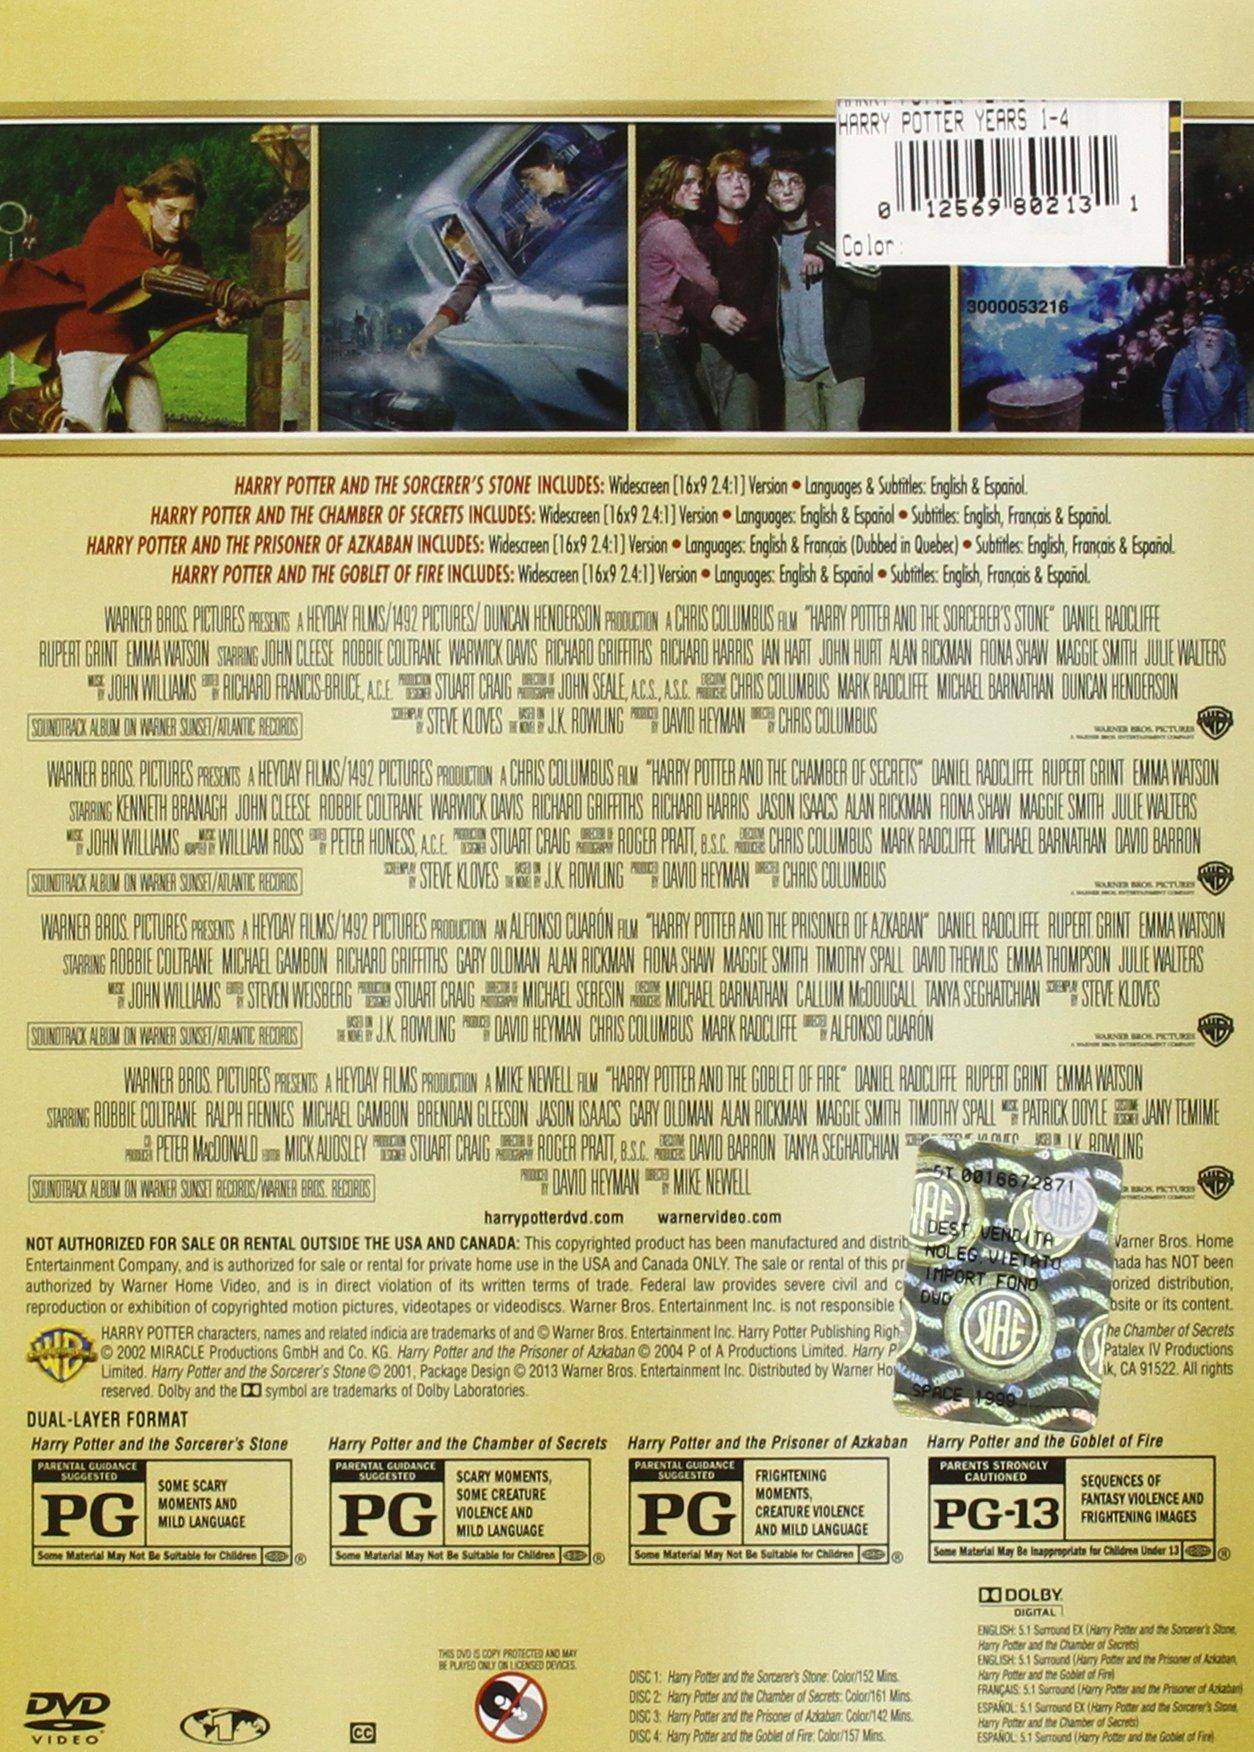 Harry Potter: Years 1-4 (Harry Potter and the Sorcerer's Stone / Chamber of Secrets / Prisoner of Azkaban / Goblet of Fire)